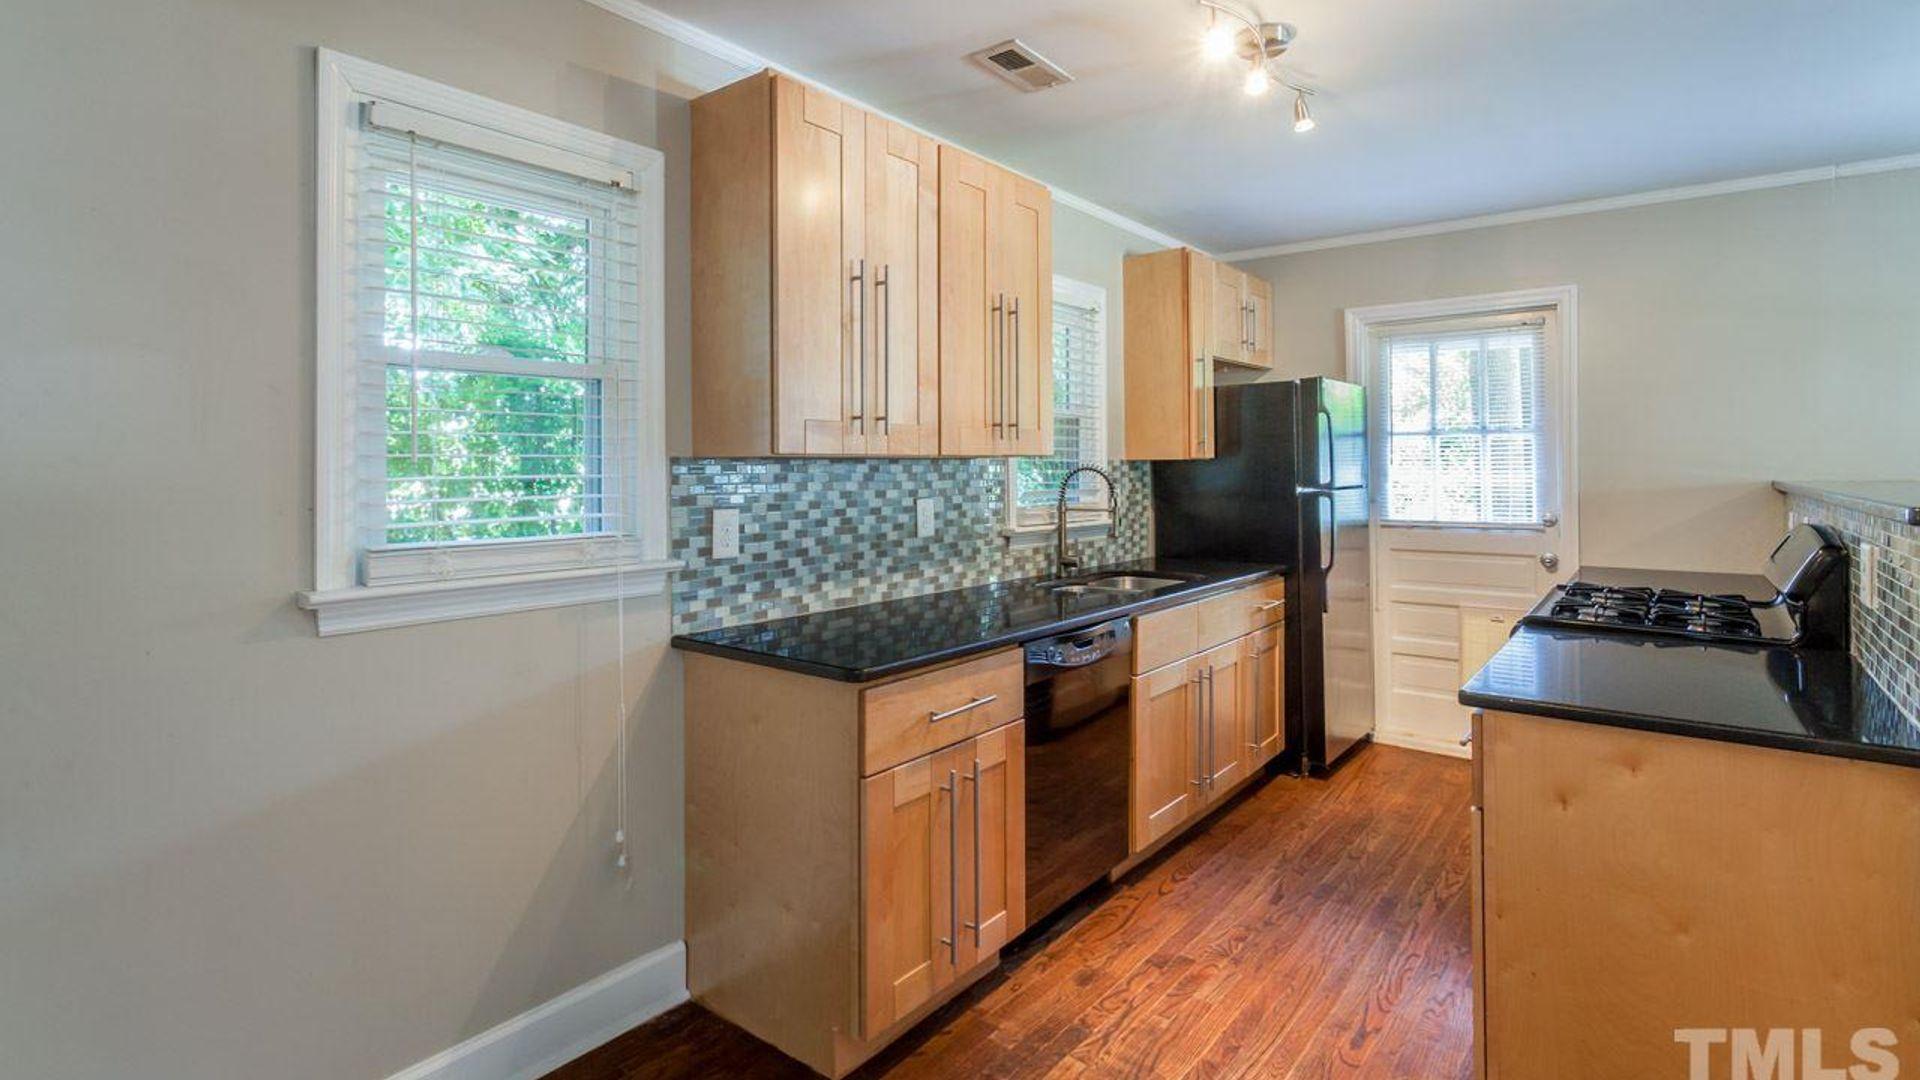 1-bed duplex at 419 Bickett Boulevard, Raleigh, NC 27608 ...